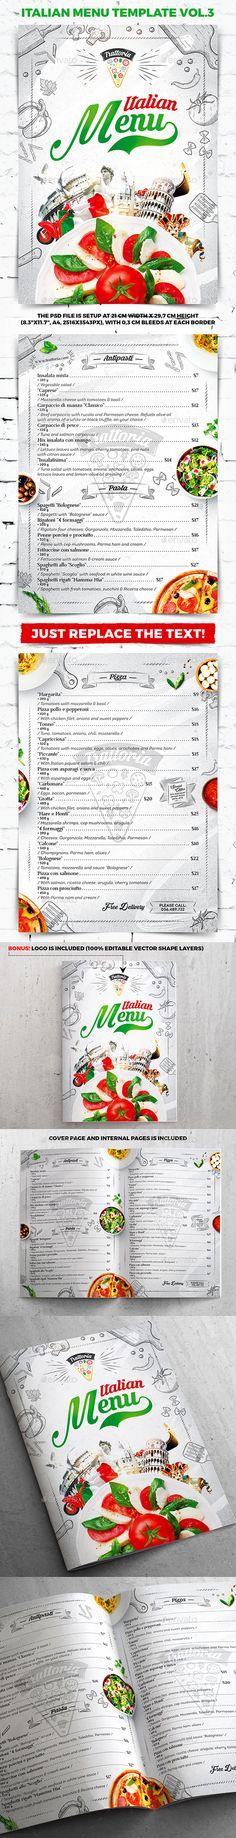 Italian Menu Template vol.3 — Photoshop PSD #pizza flyer #coffee • Download ➝ https://graphicriver.net/item/italian-menu-template-vol3/20313921?ref=pxcr